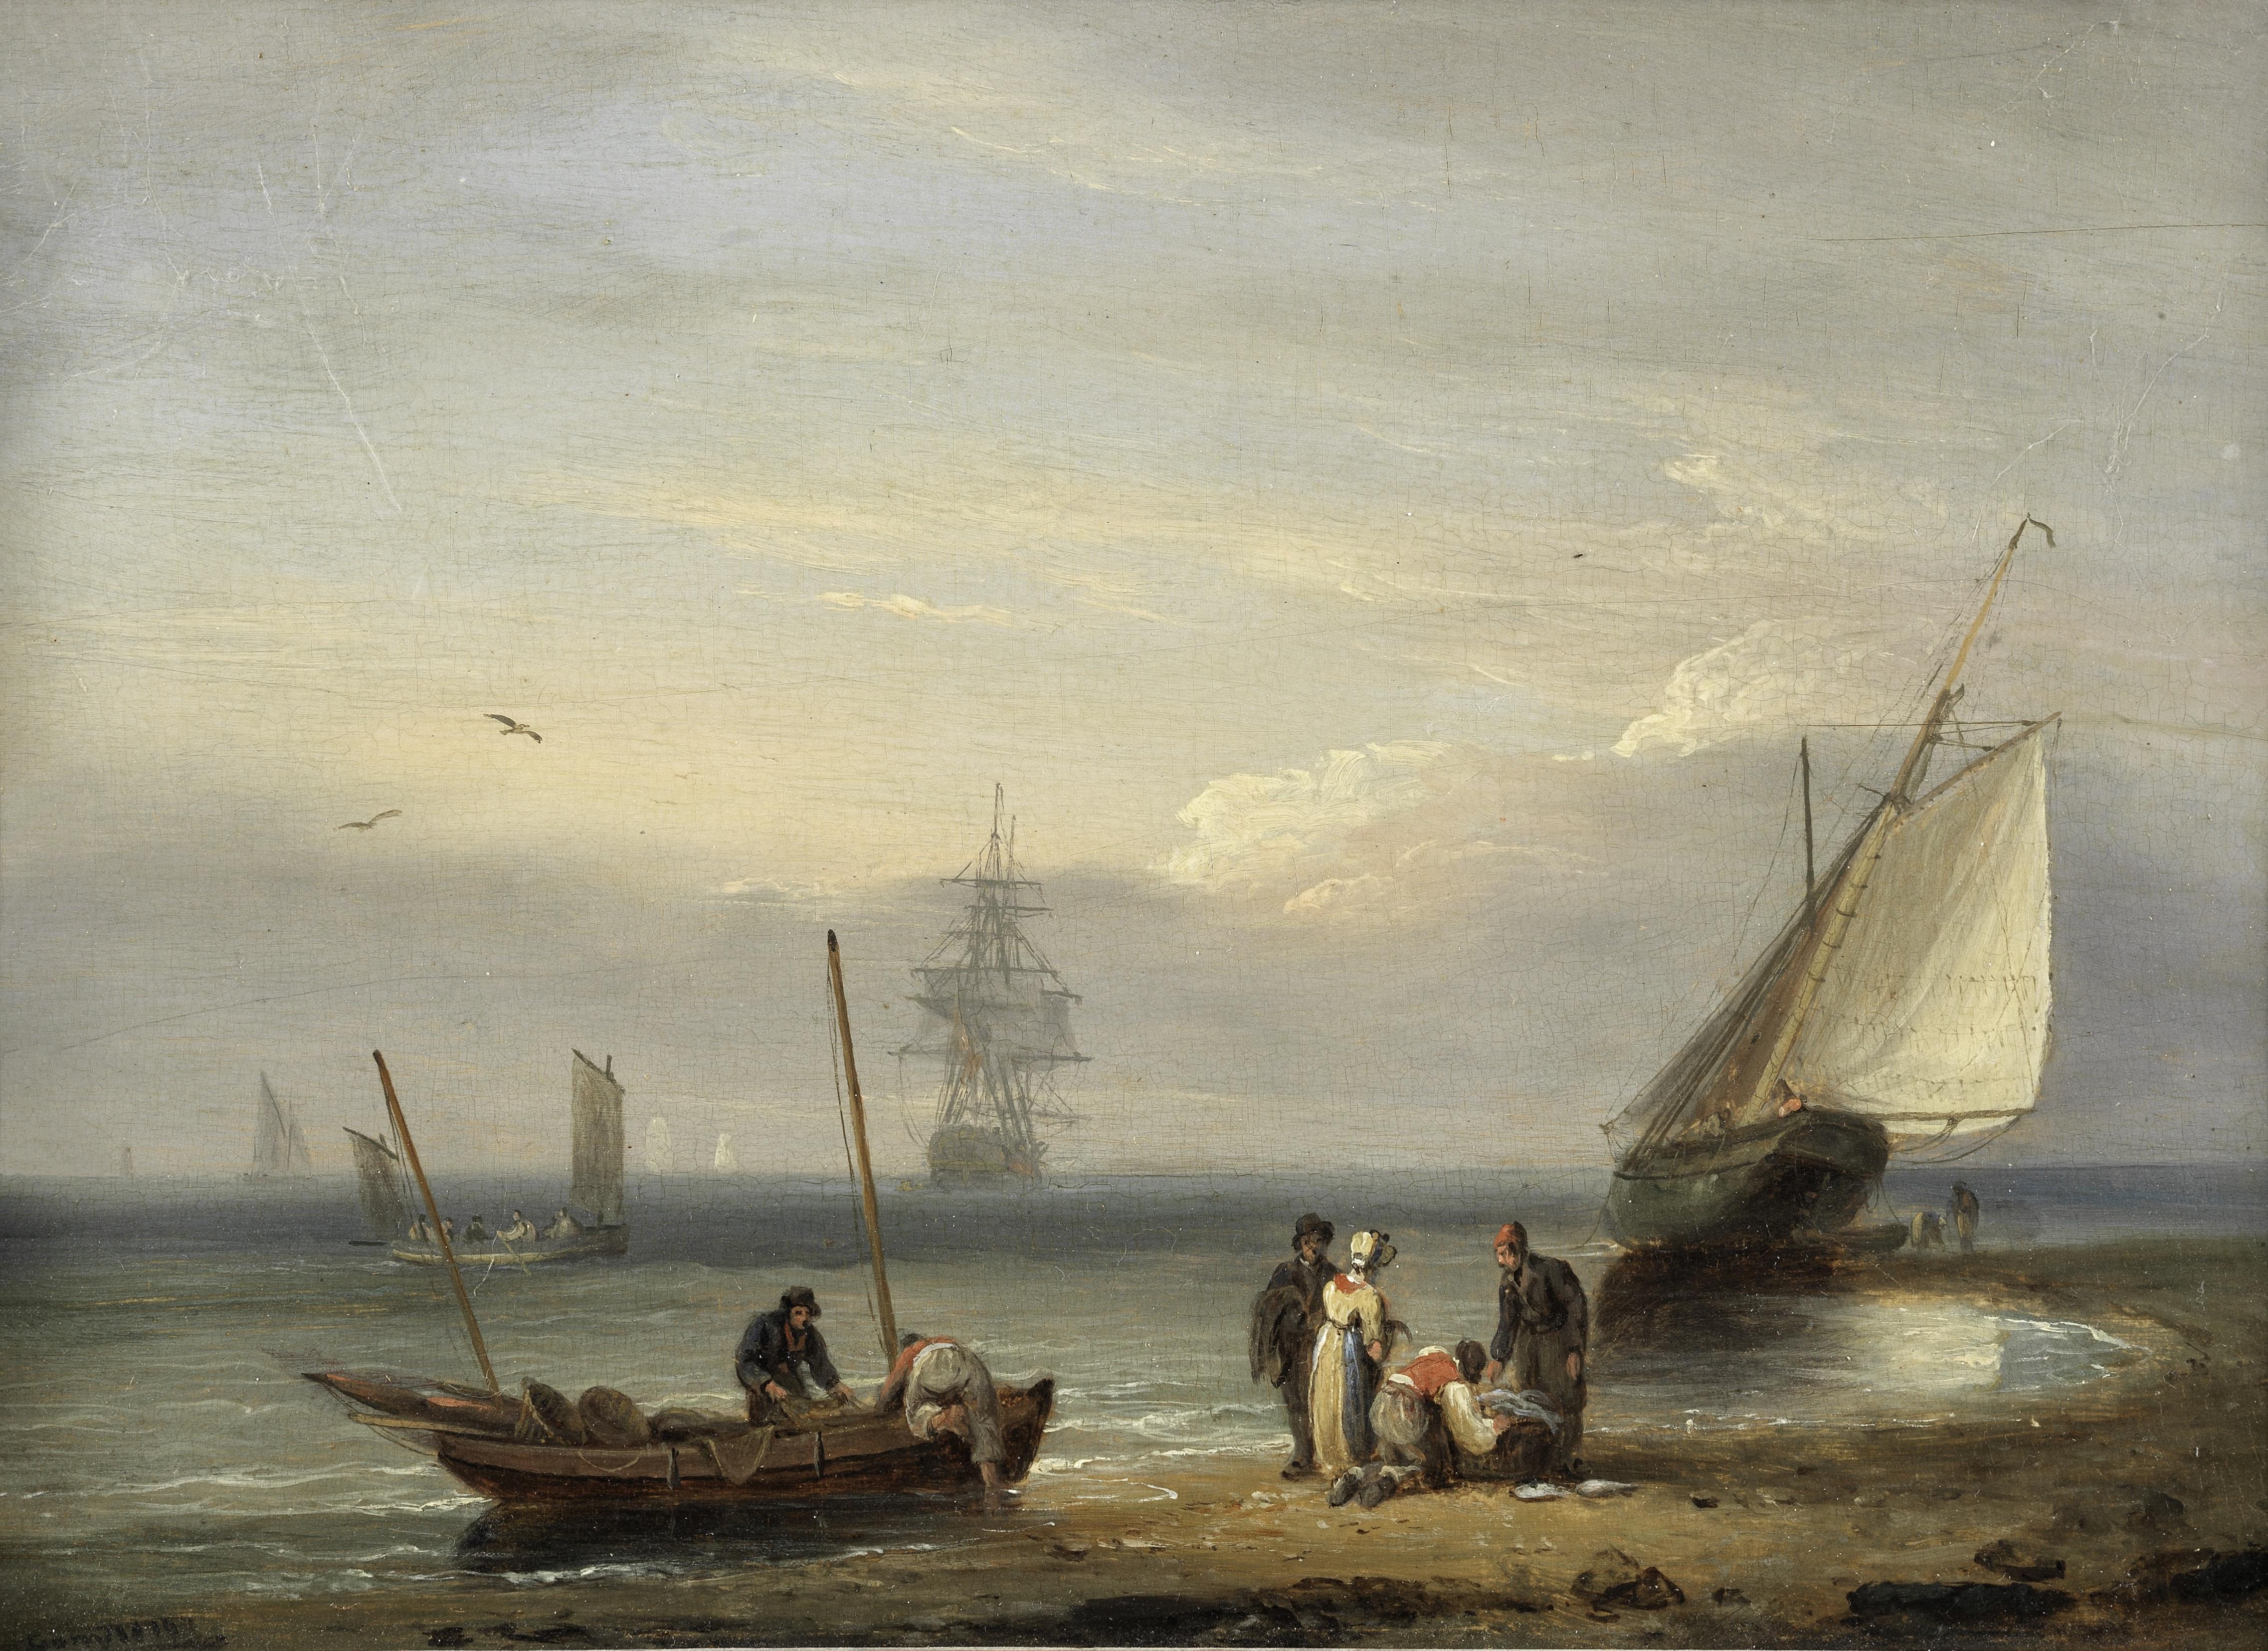 Thomas Luny (British, 1759-1837) Fisherfolk on the shore